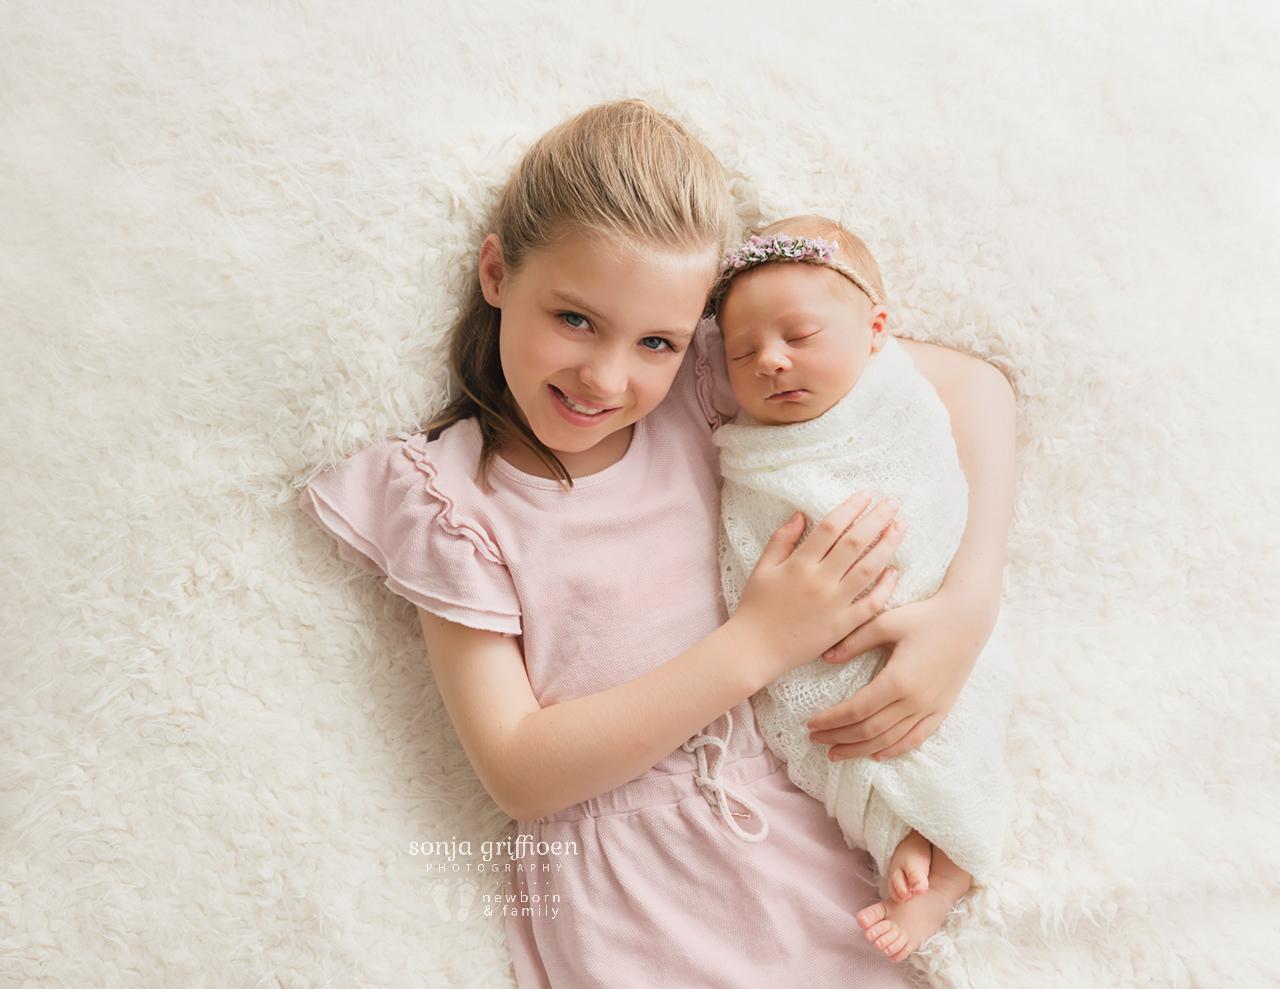 Petra-Newborn-Brisbane-Newborn-Photographer-Sonja-Griffioen-02.jpg